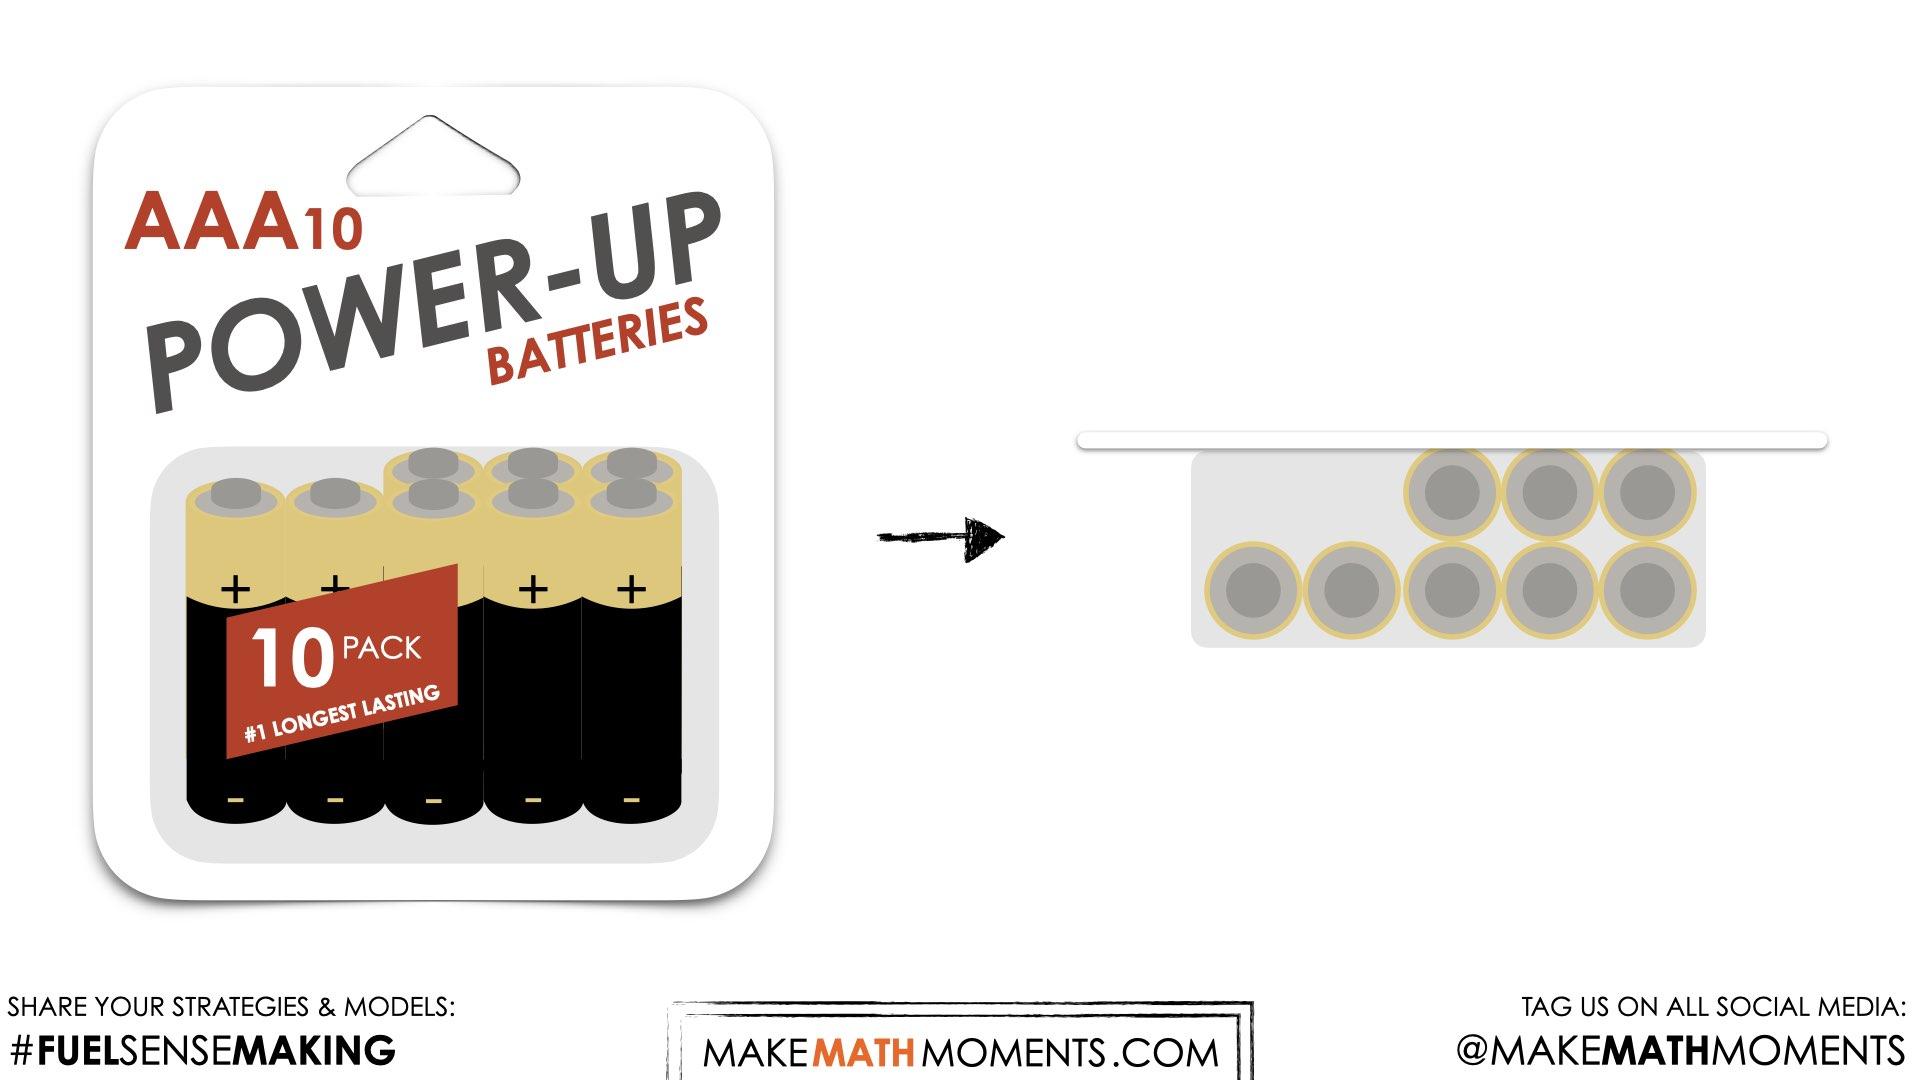 Missing Batteries [Day 1] - Defective Packages - 04 - SPARK Prompt Image 2.001